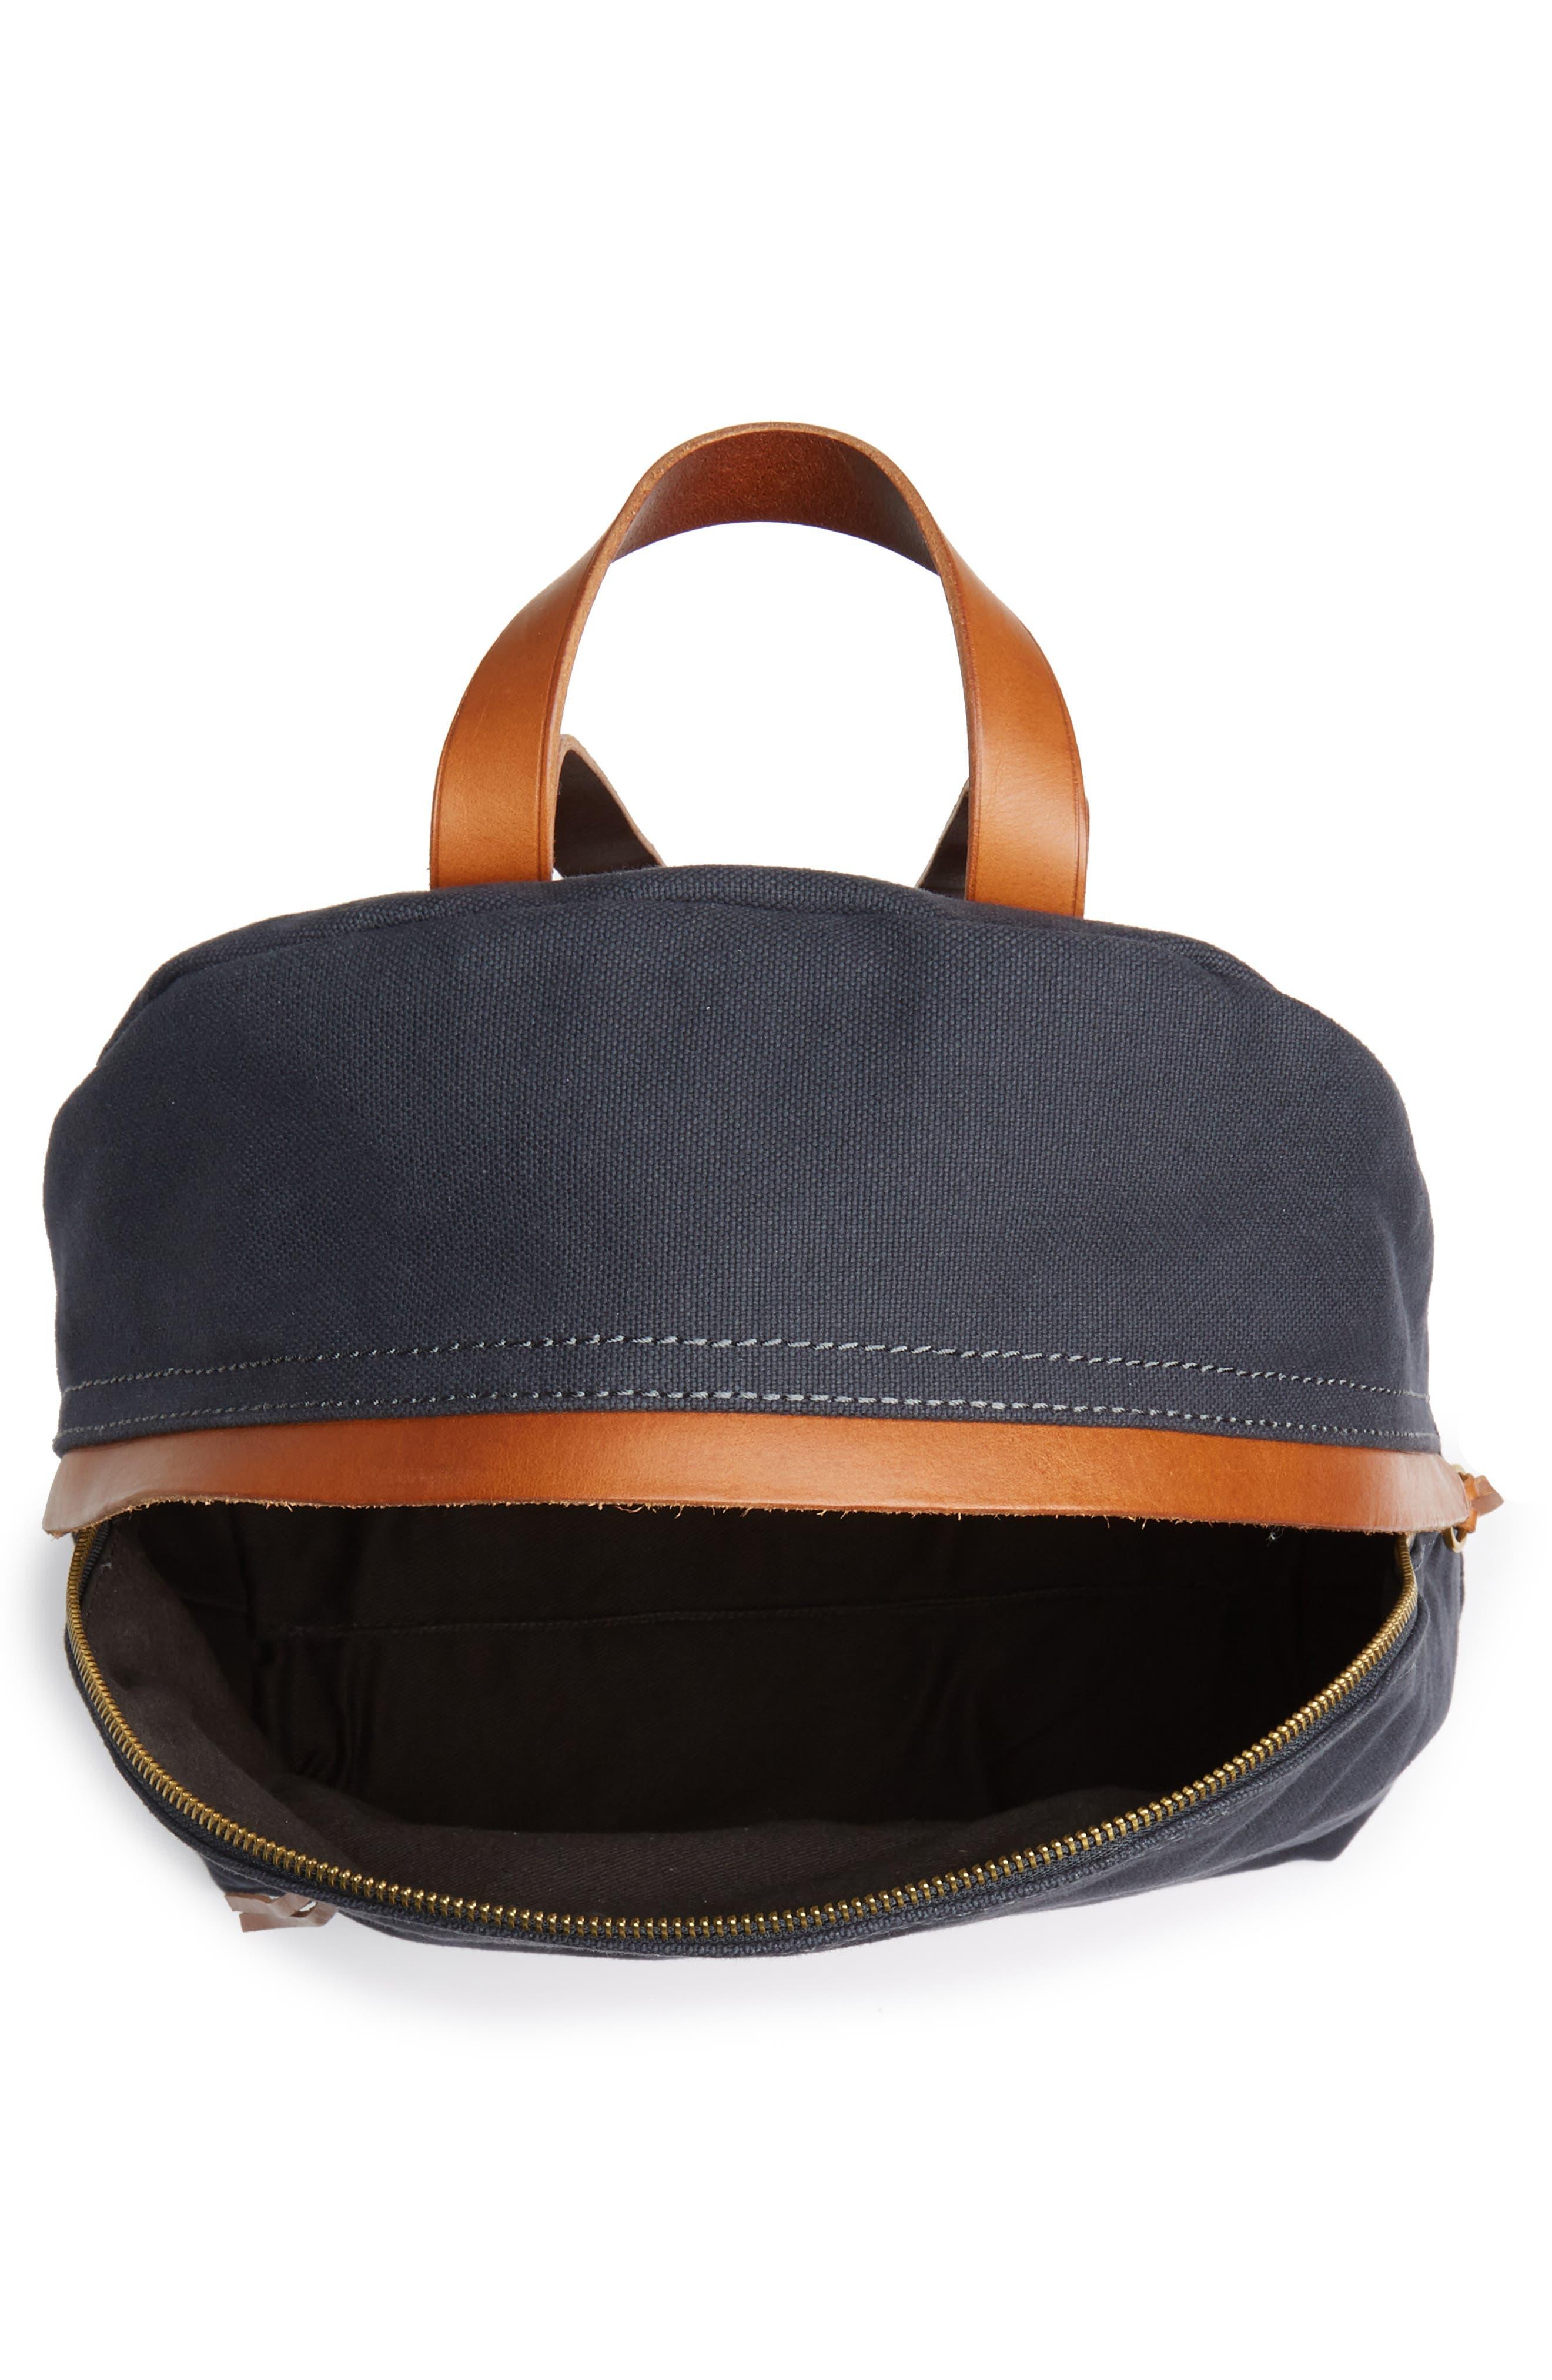 MADEWELL, The Charleston Backpack, Alternate thumbnail 5, color, BLACK SEA